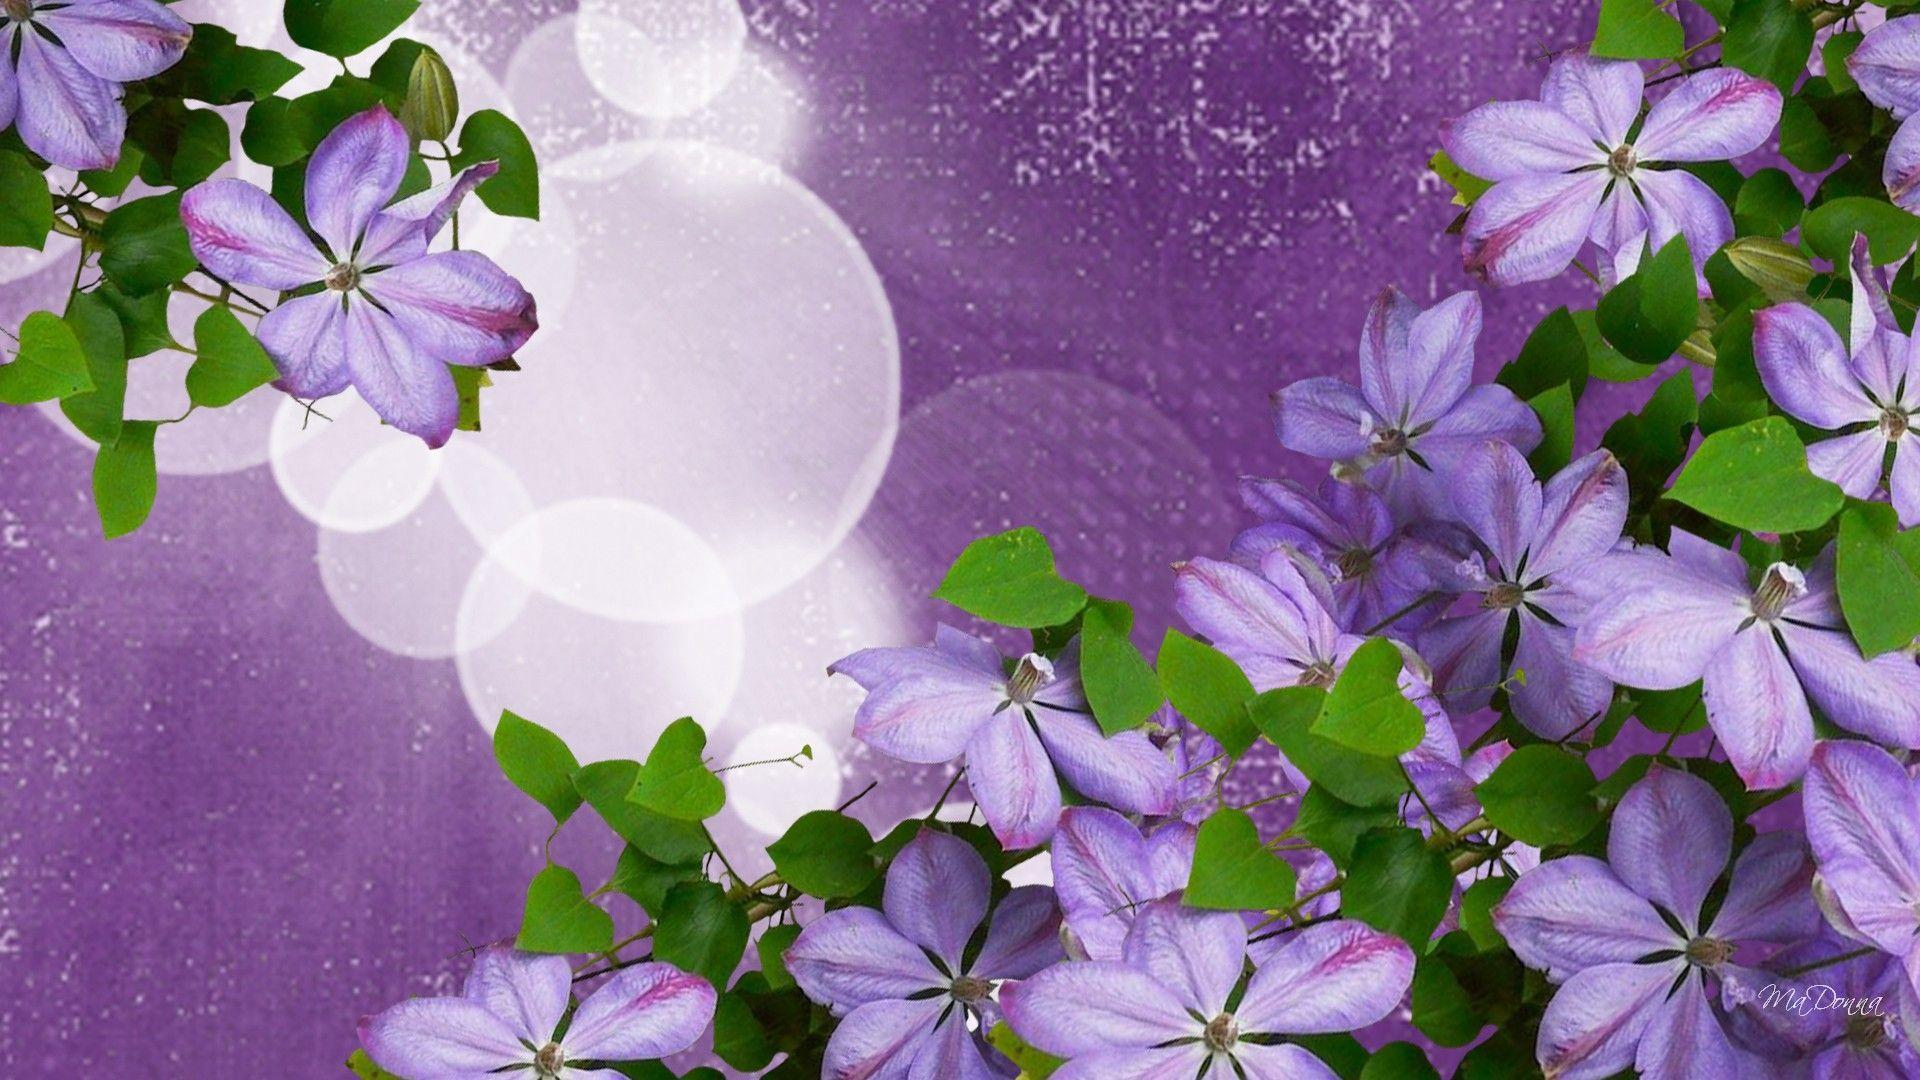 lavender flower wallpapers  wallpaper cave, Natural flower